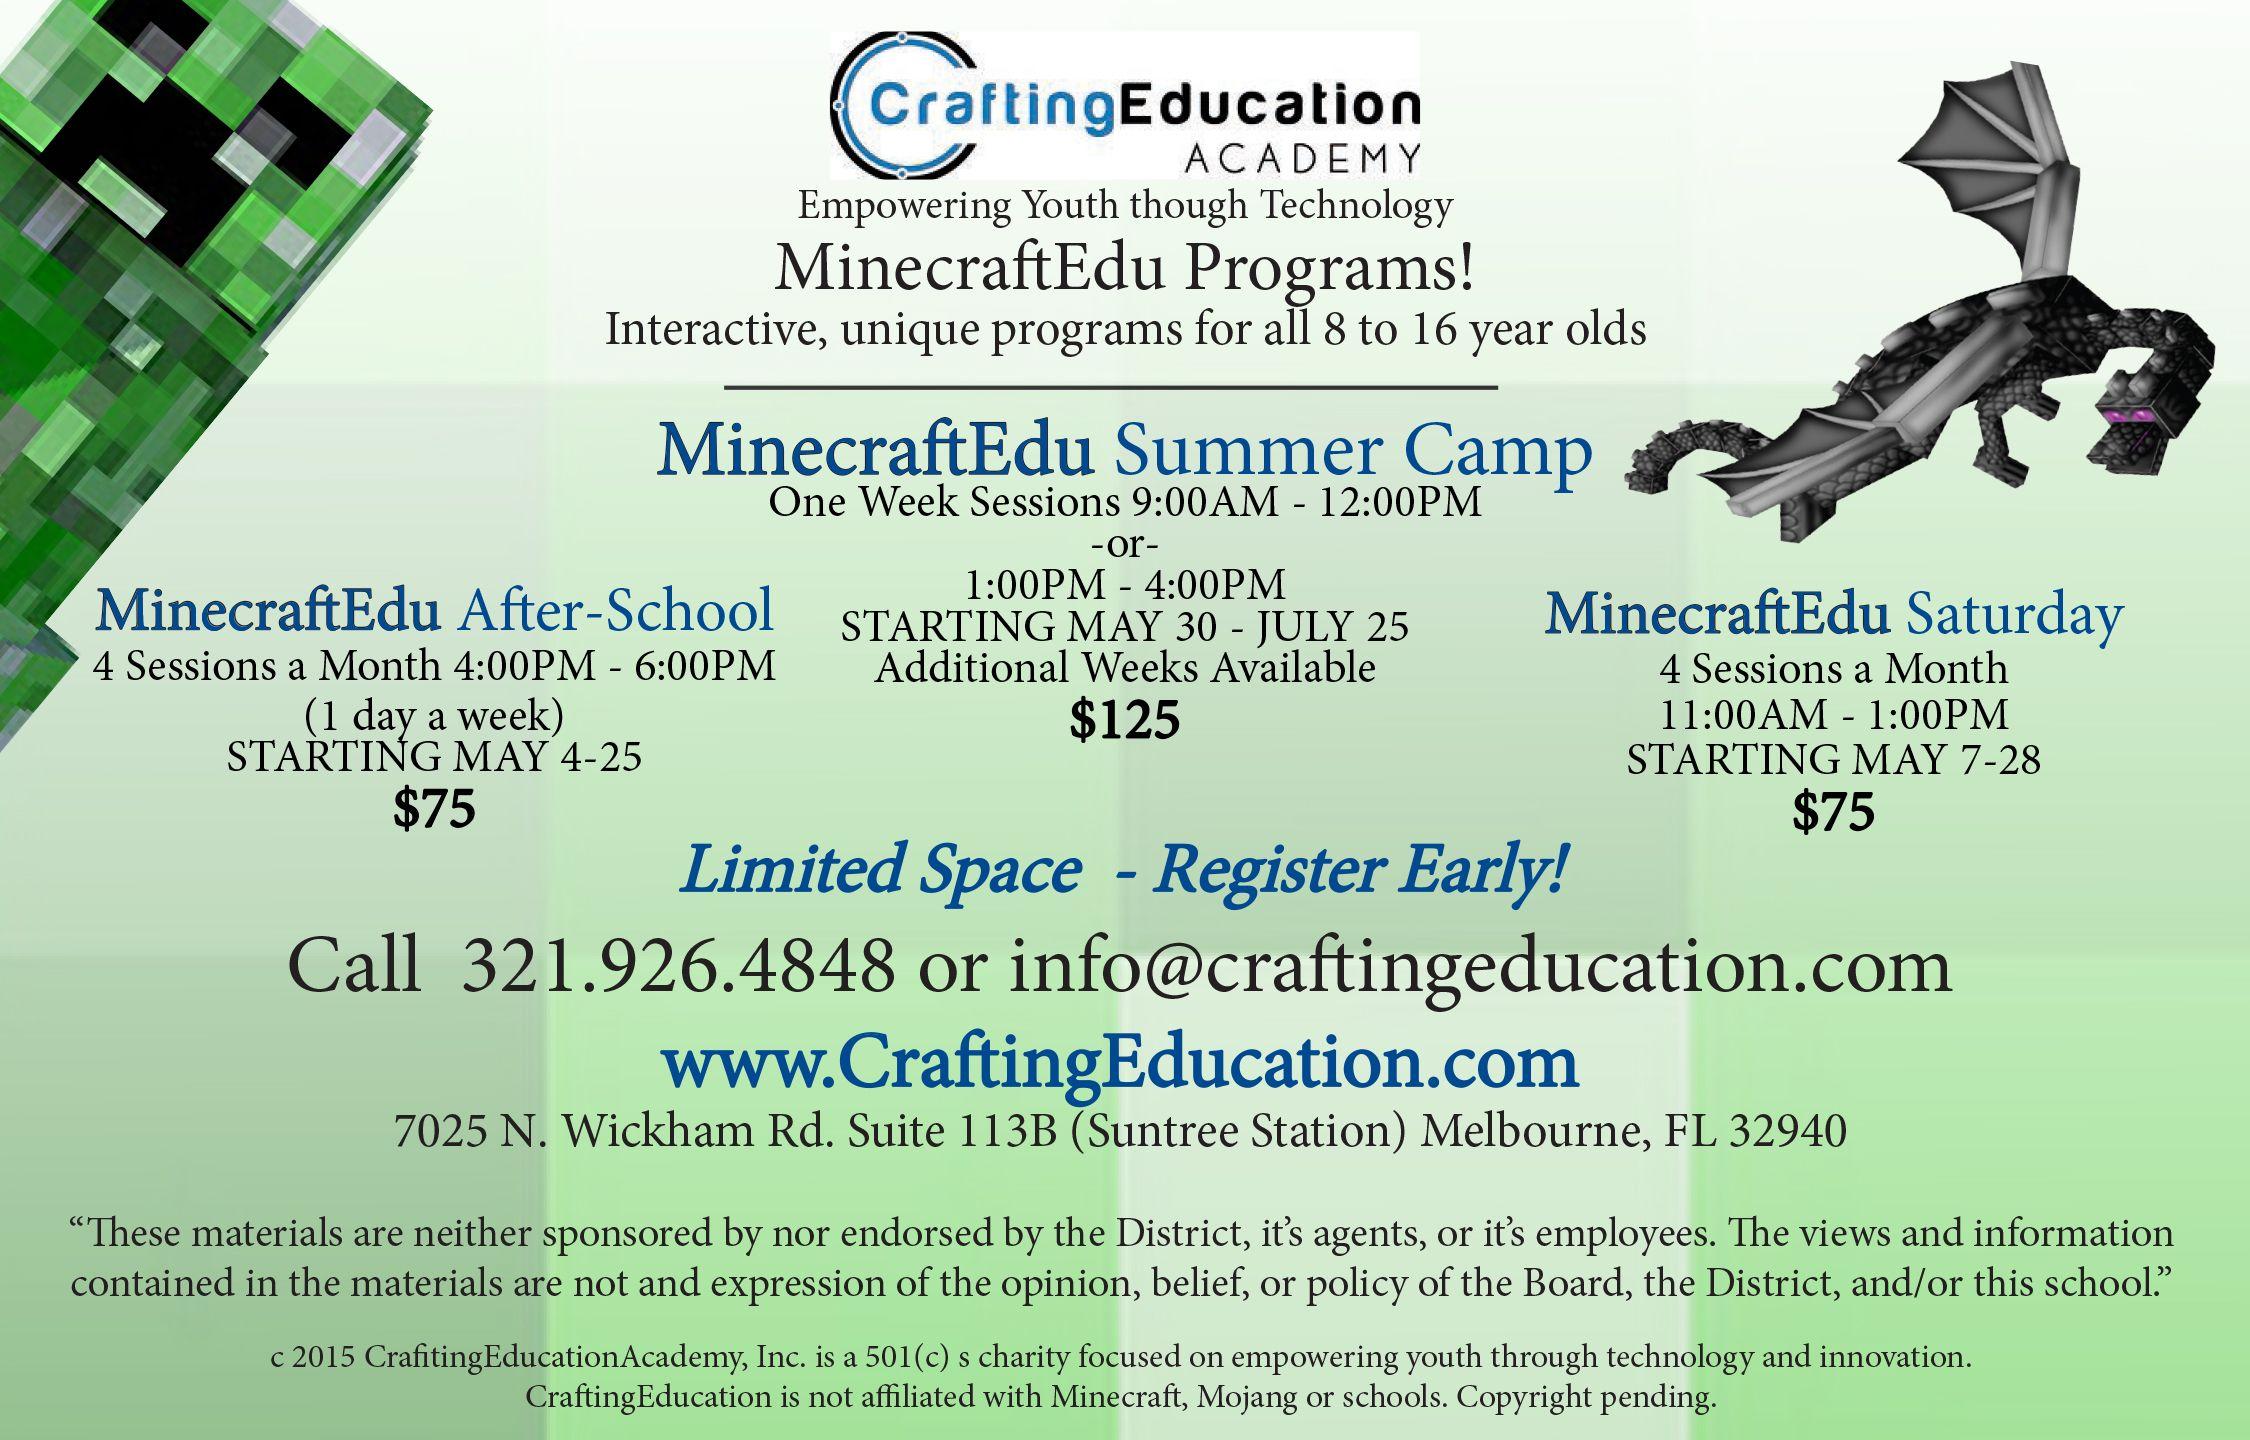 Crafting Education Academy Military Discount Network Developing Leadership Skills Leadership Skills Education